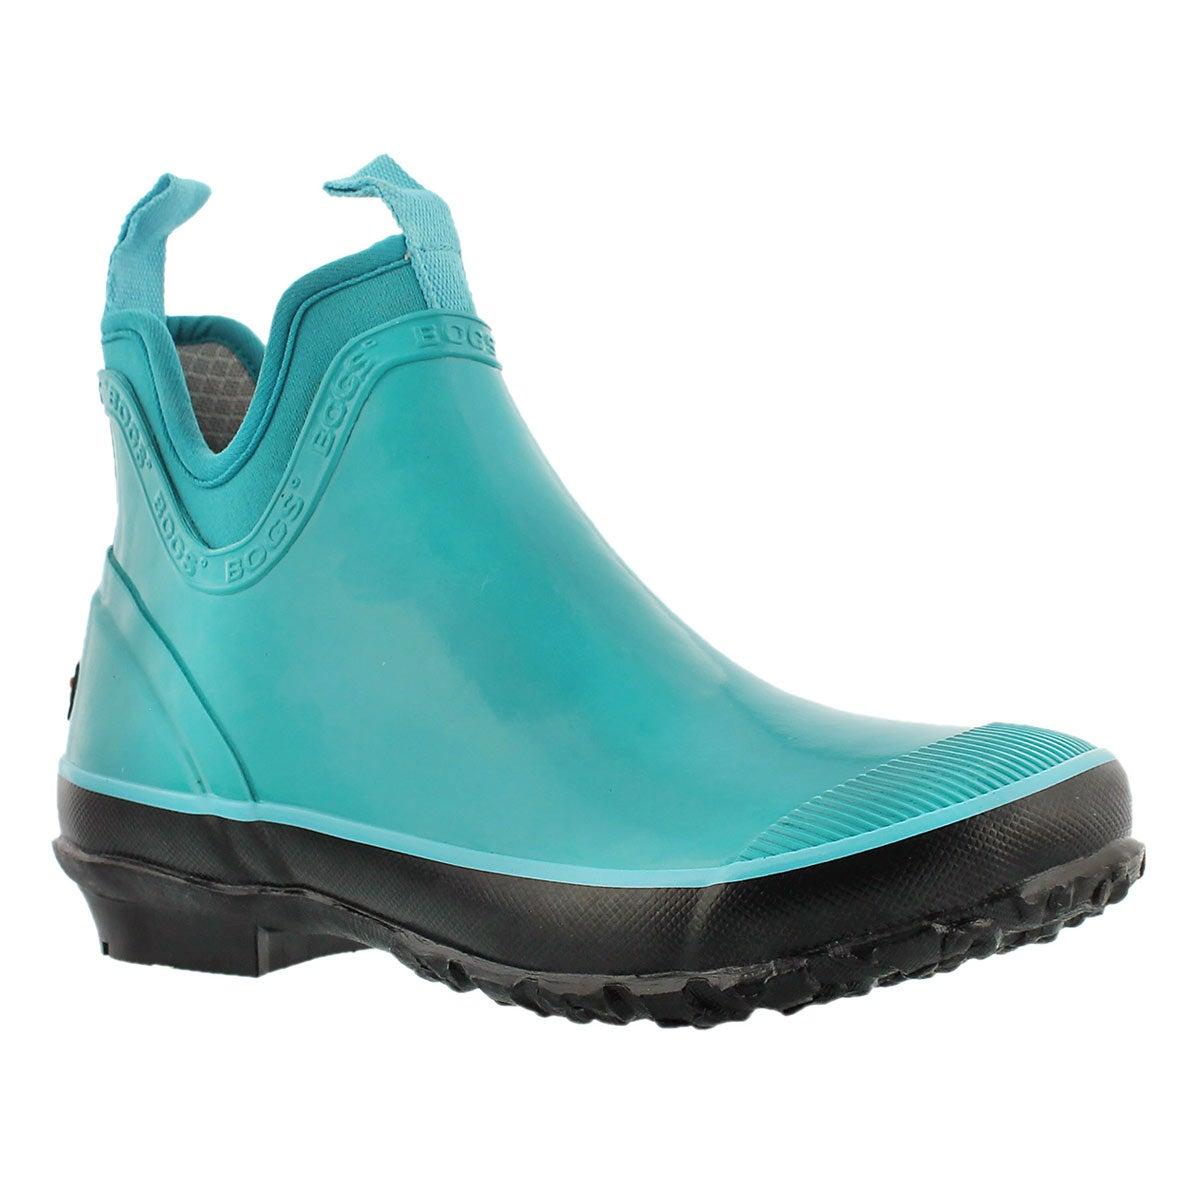 Lds Harper Solid teal chelsea rain boot